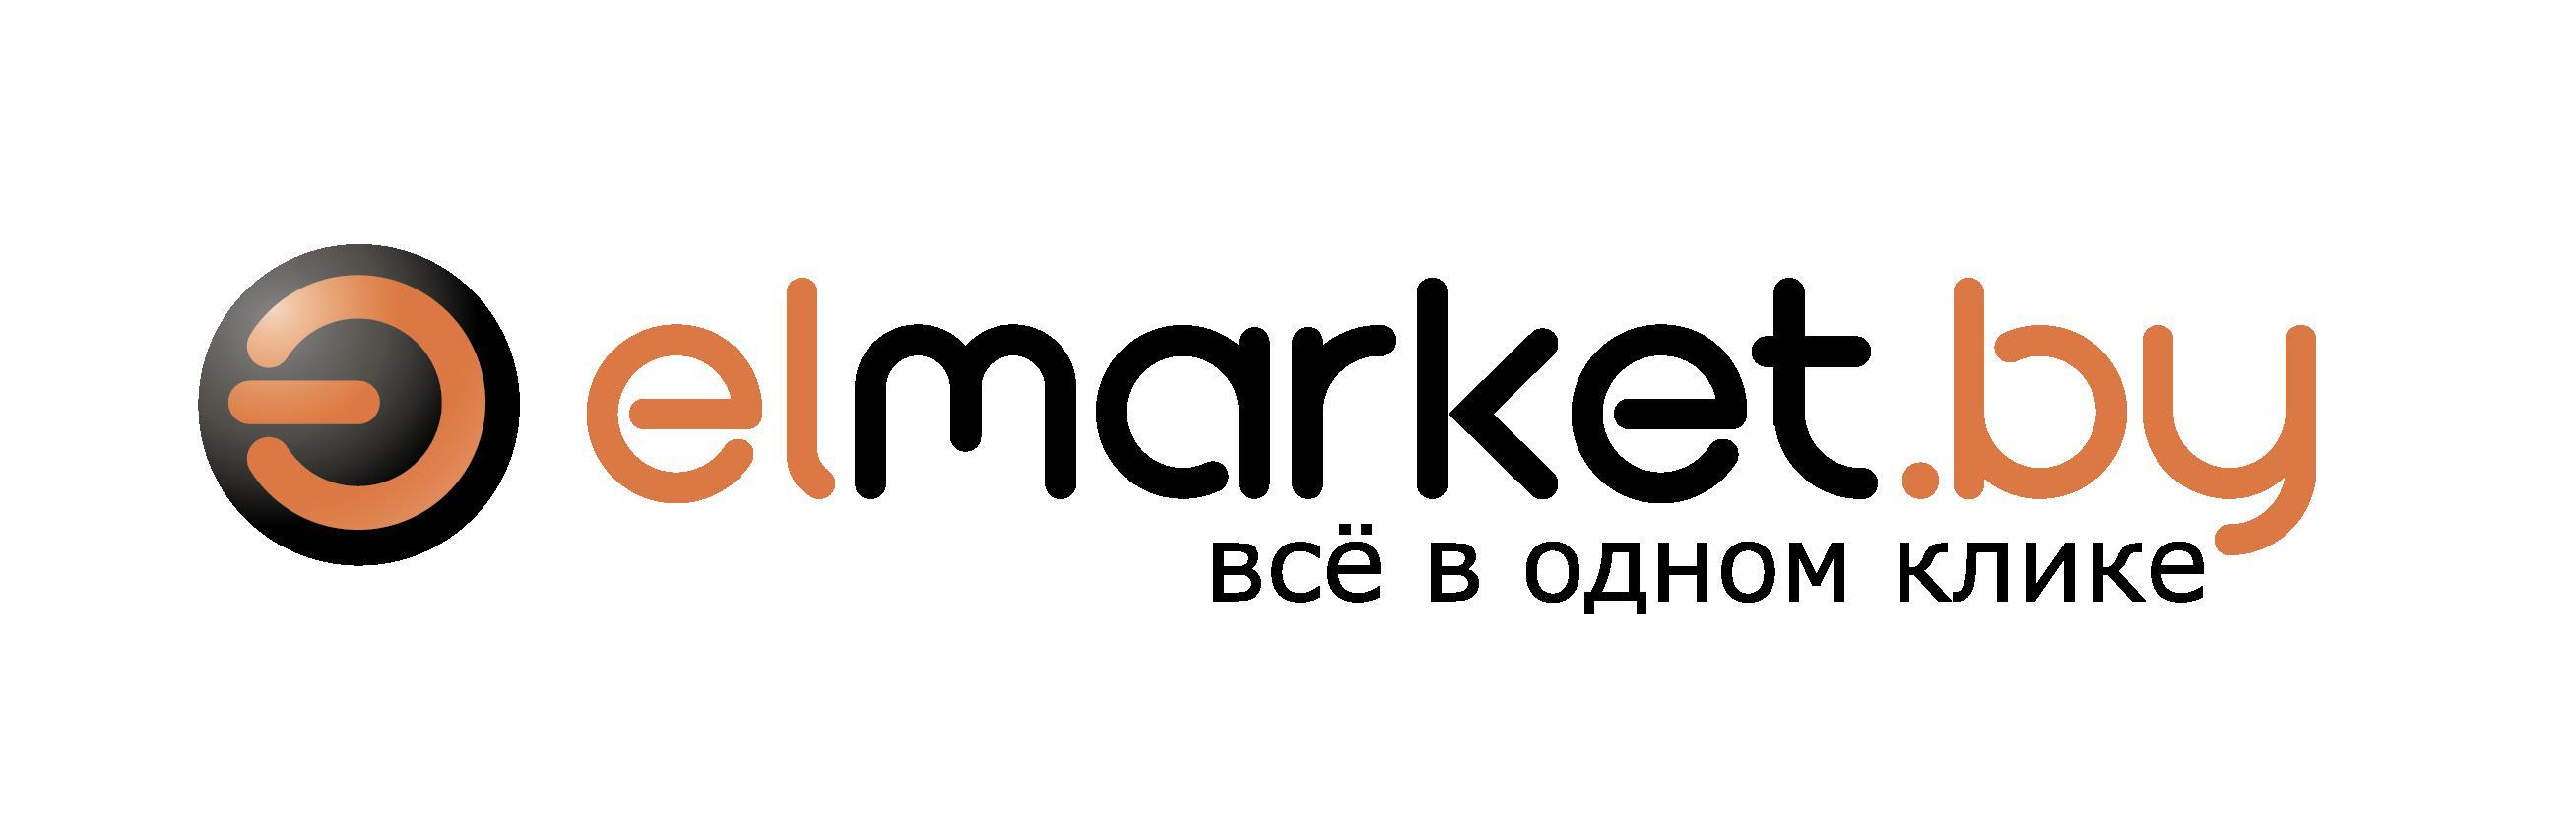 Интернет магазин Elmarket.by